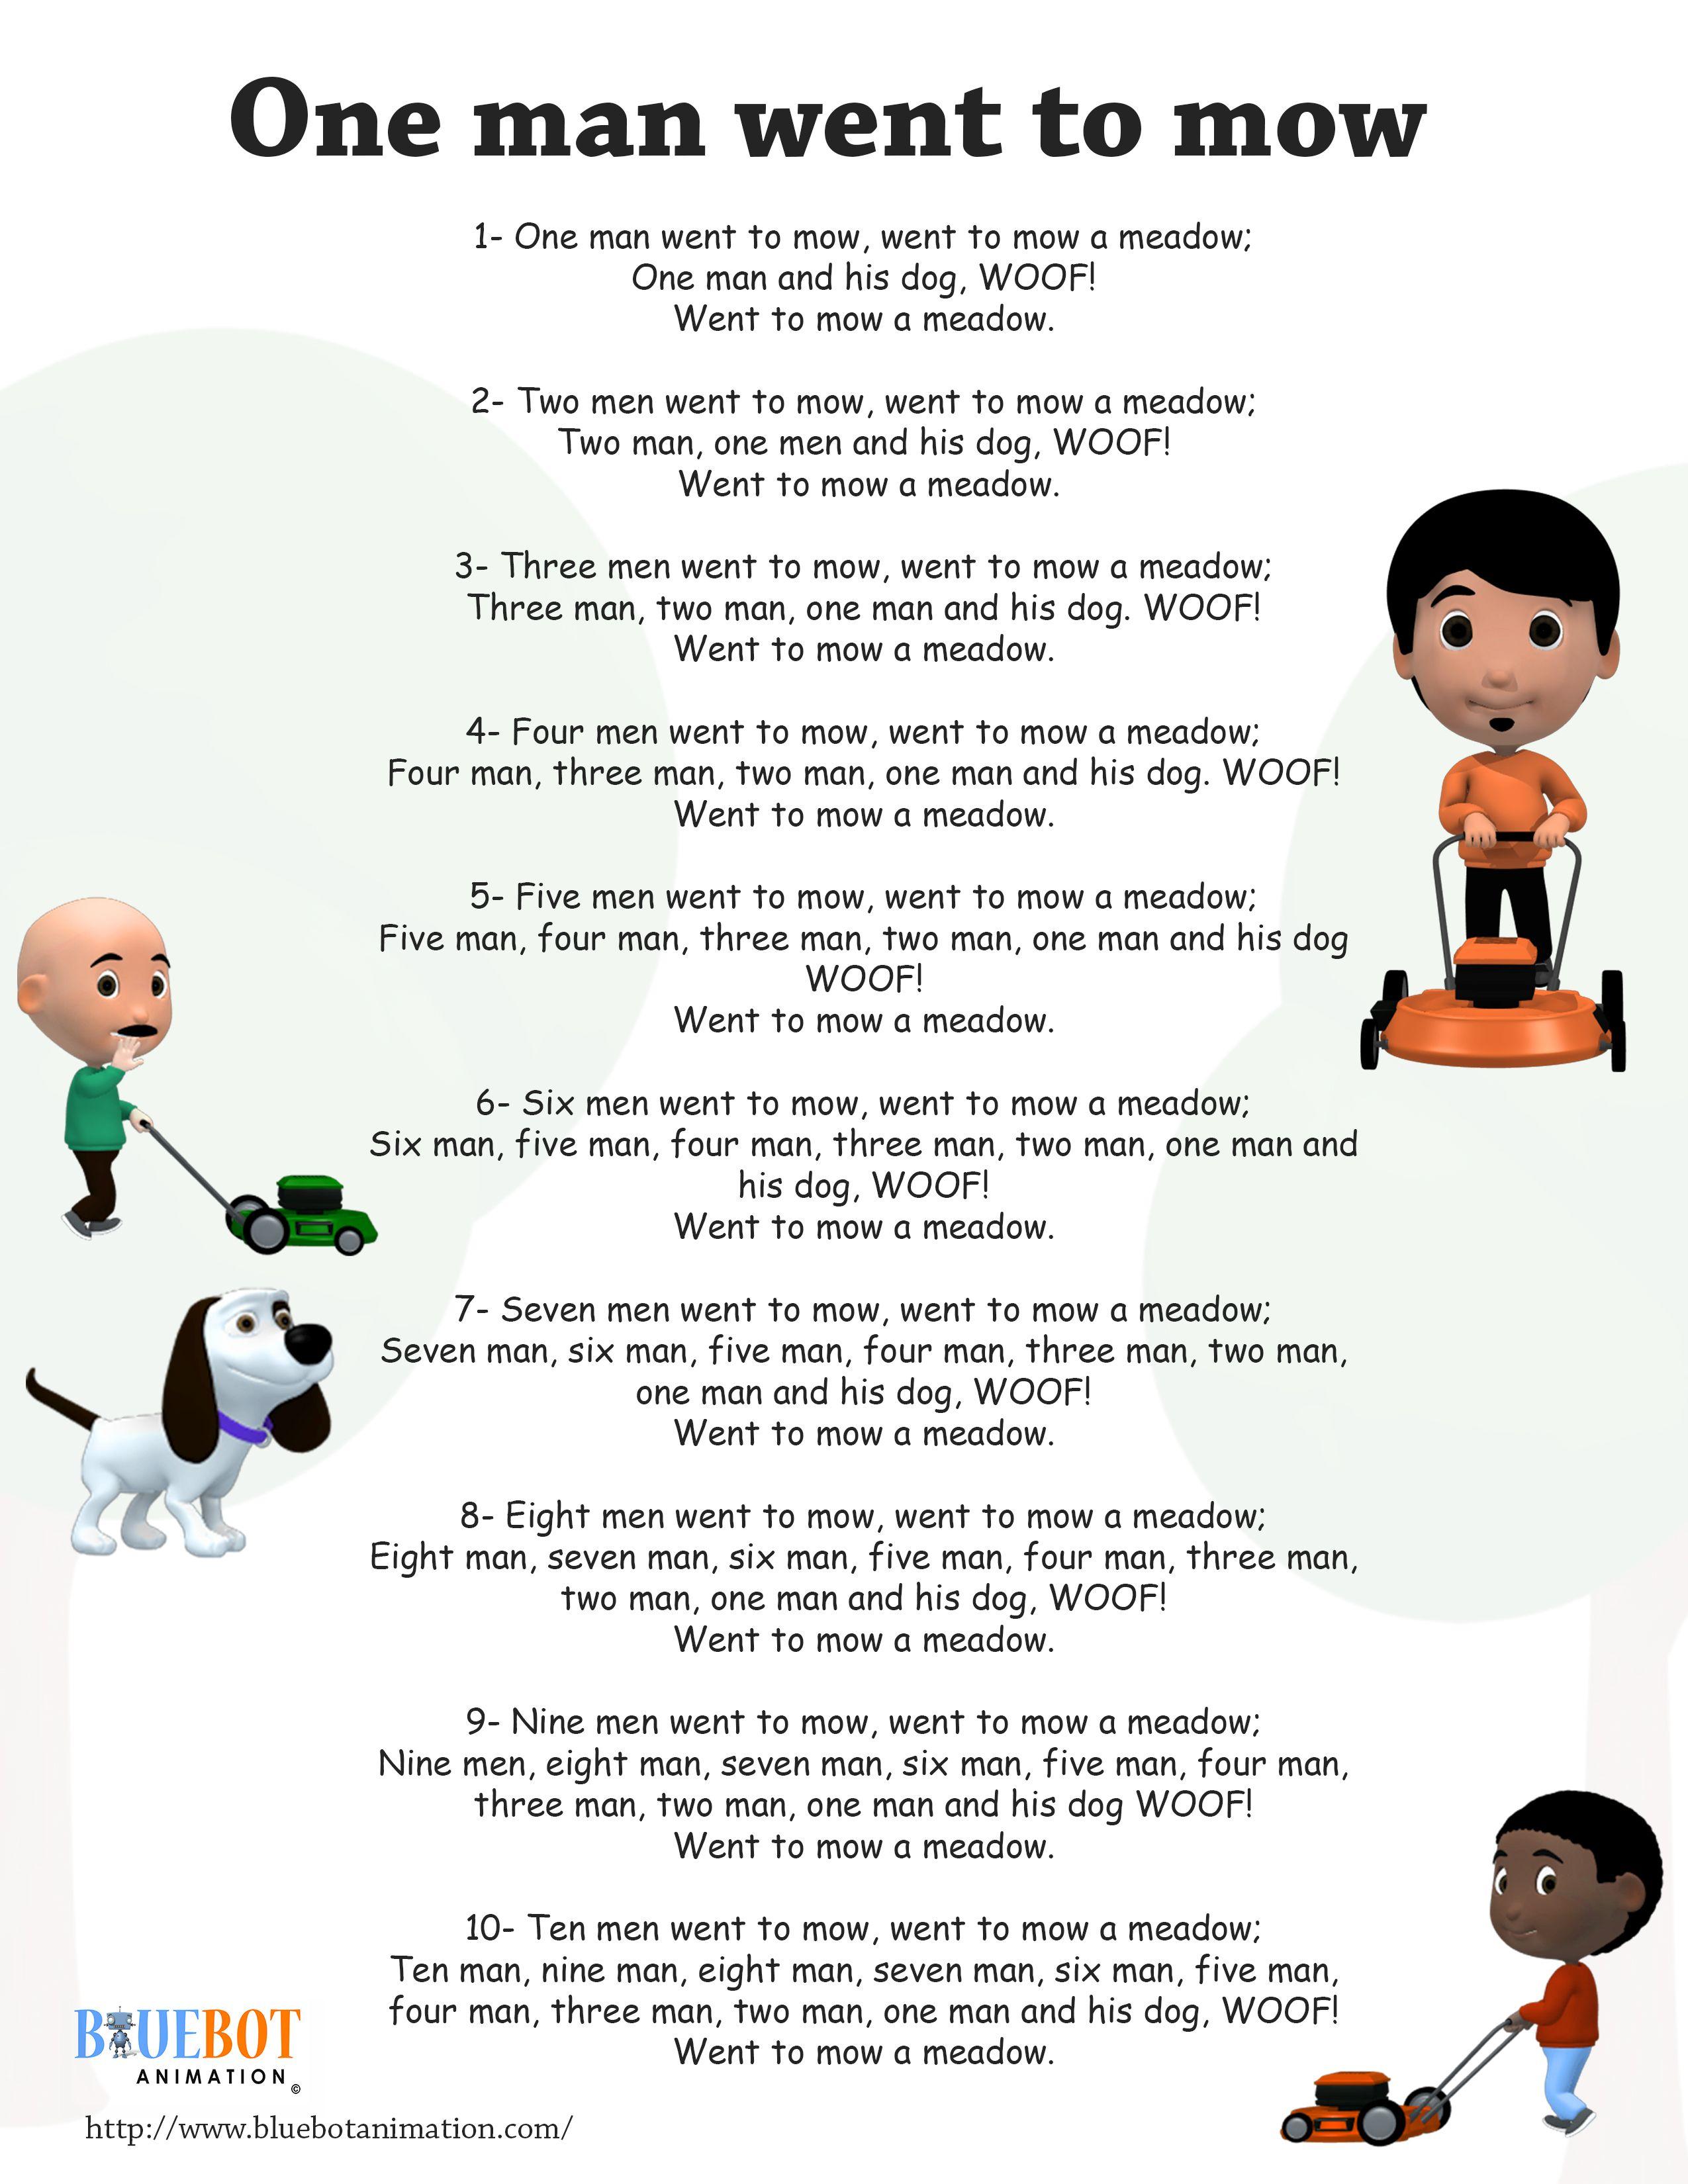 10 Men Went To Mow Nursery Rhyme Lyrics Free Printable Nursery Rhyme Lyrics Page 10 Men Went